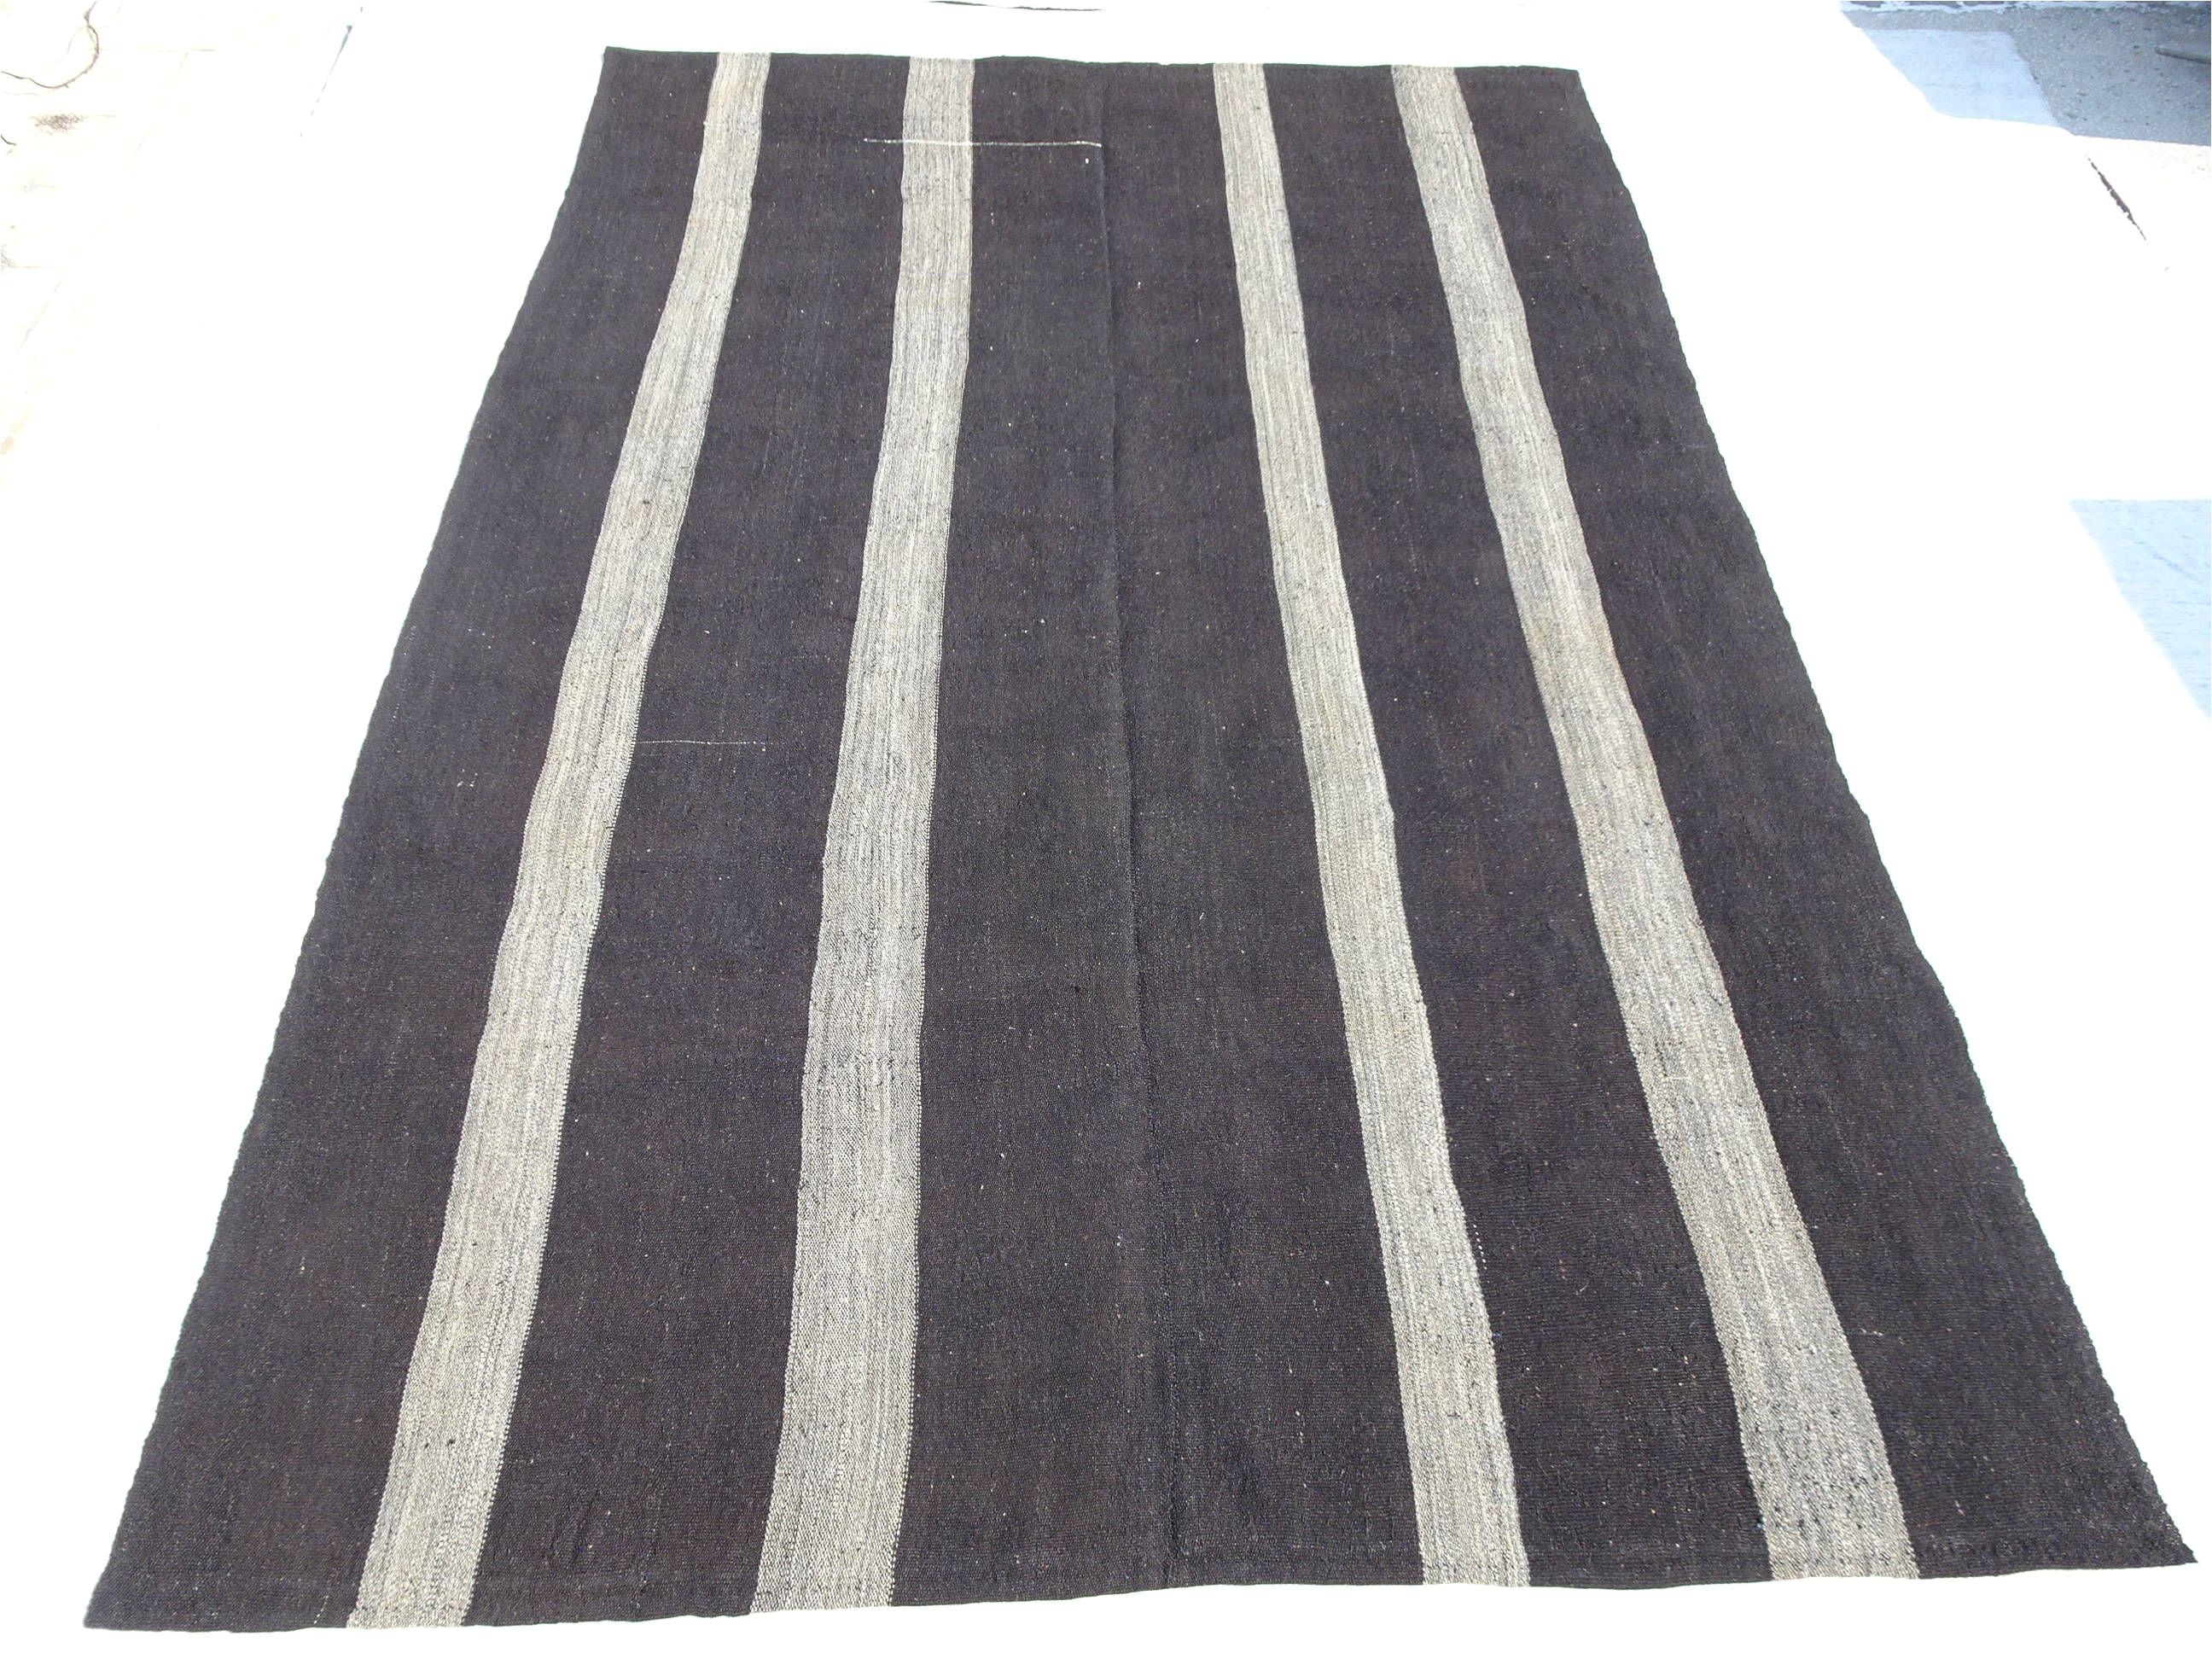 Black and White Kilim Rug Runner Oversize Gray and Black Kilim Rug 8 9 X12 9 Feet 267×388 Cm Natural